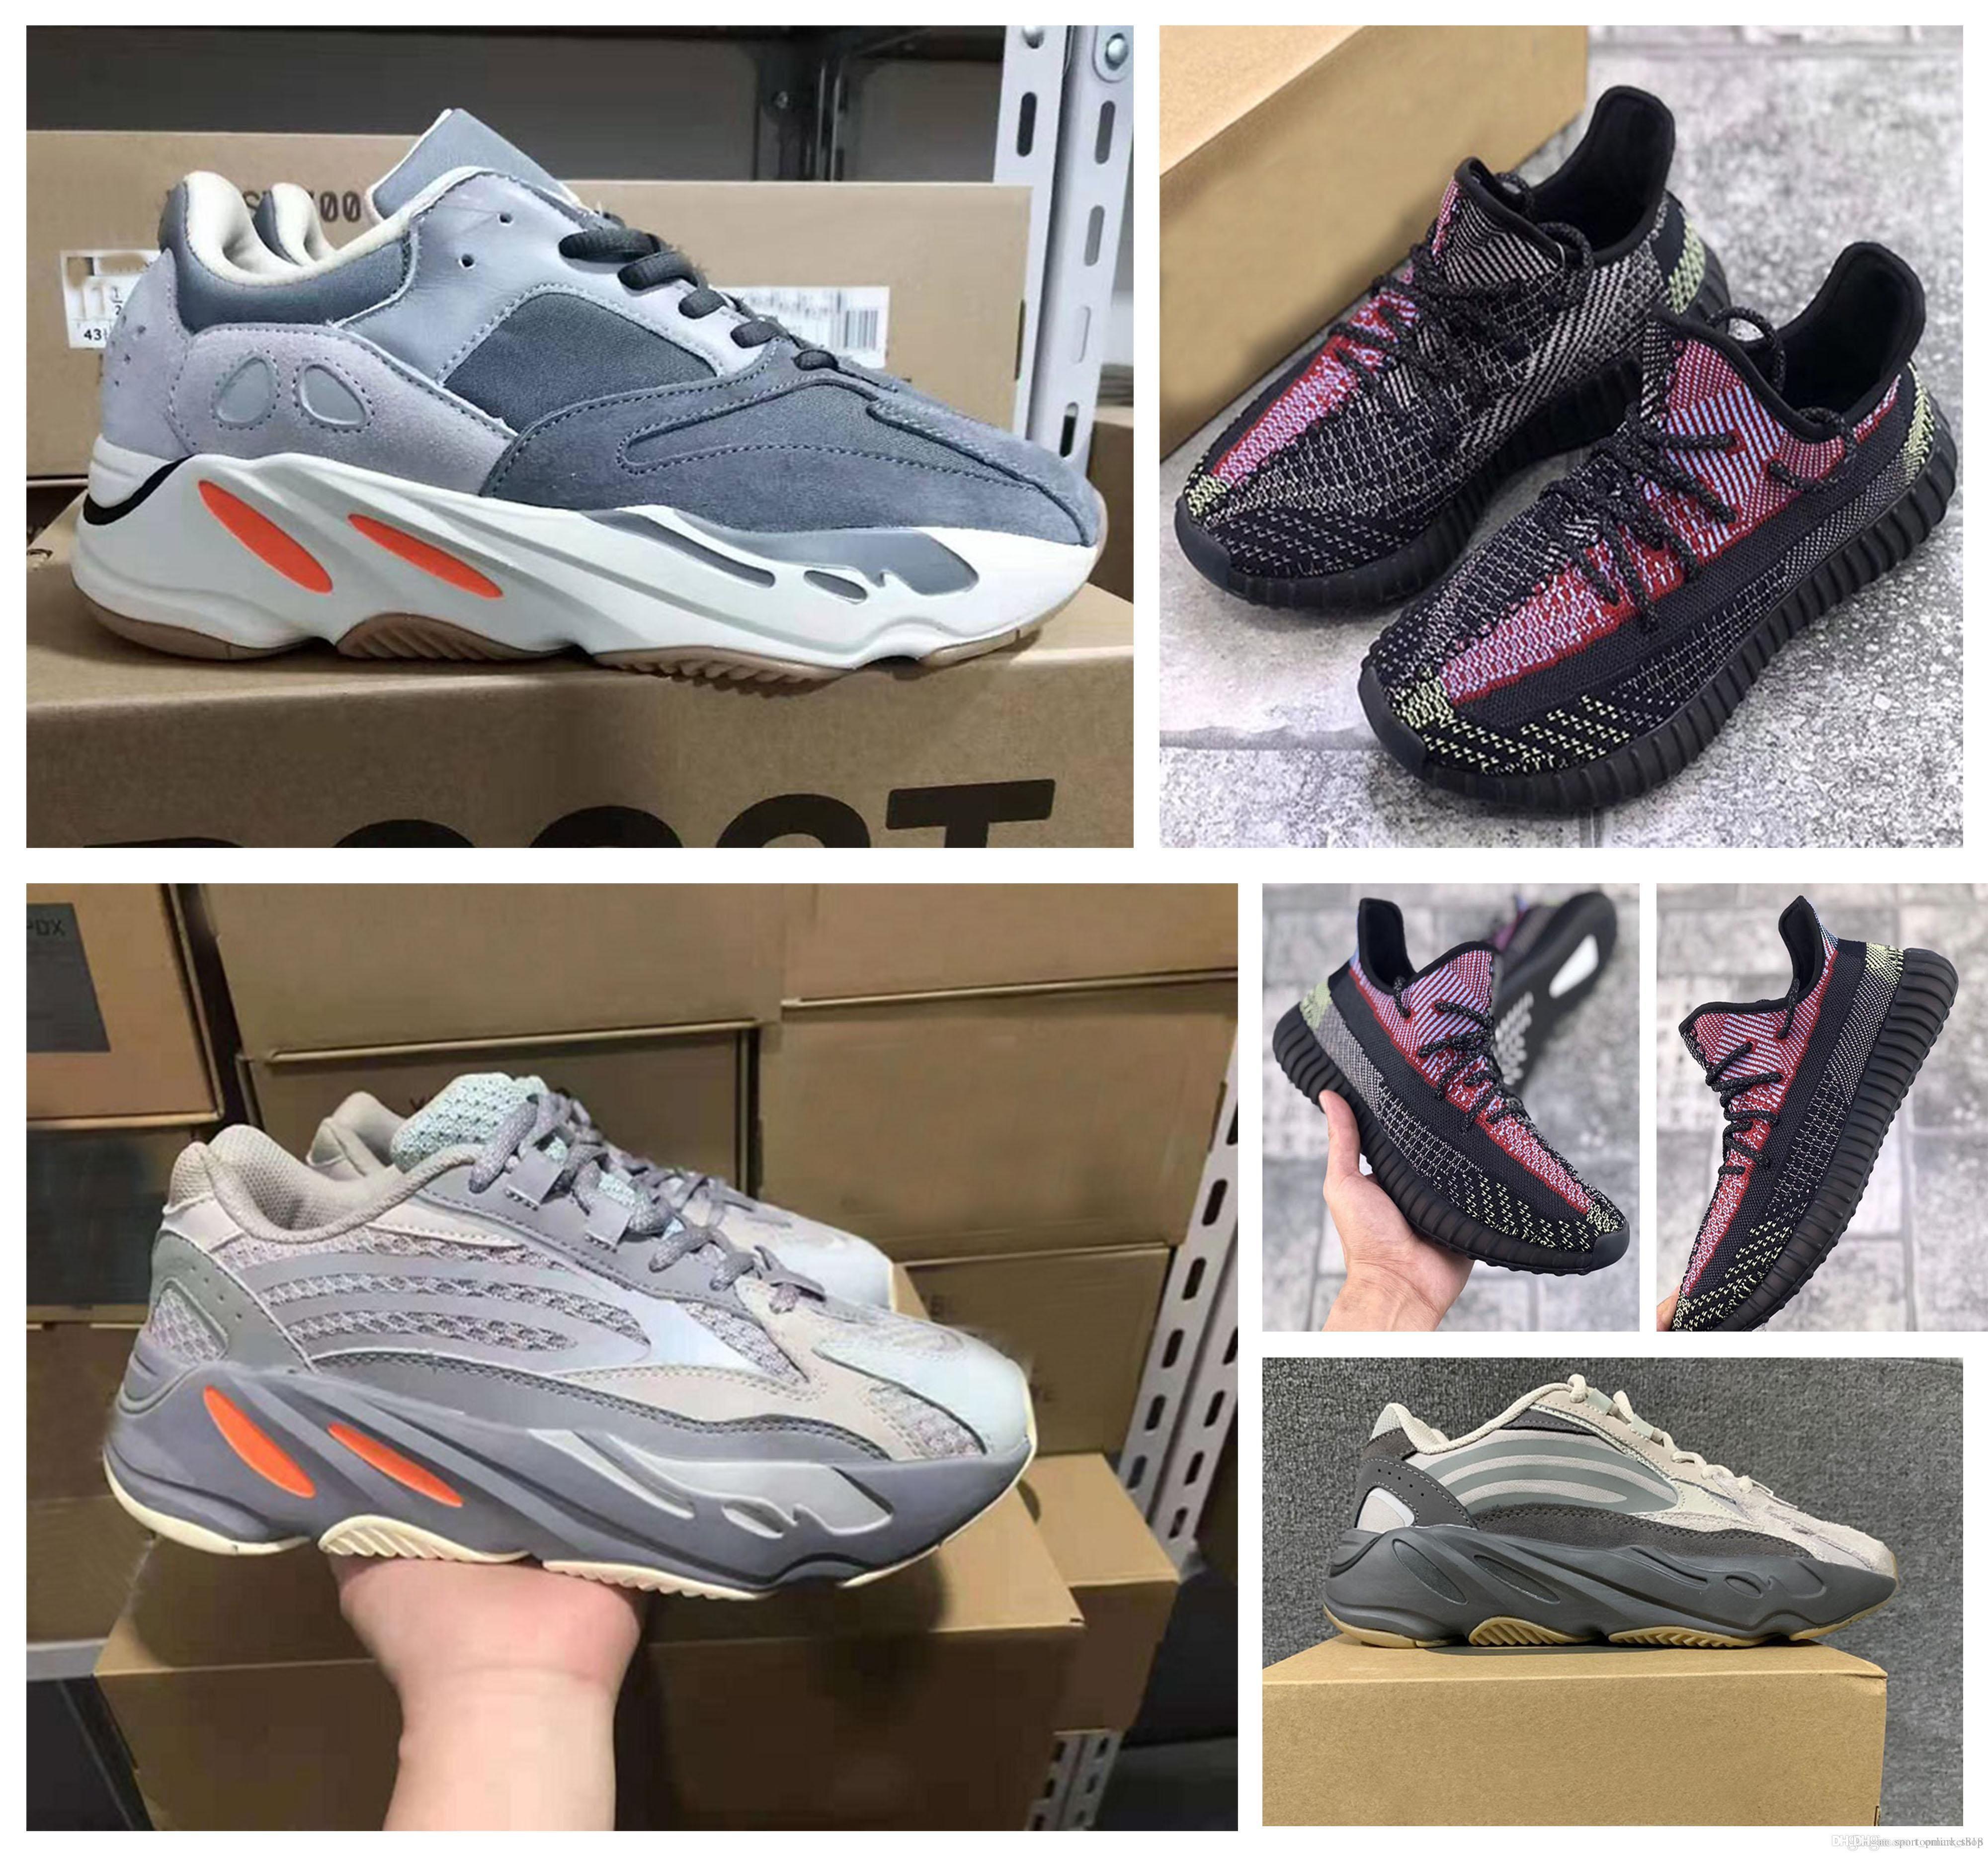 2020 Nuovo arrivo 700 v2 inerzia kanye west v2 yecheil scarpe da corsa 500 osso bianco uomo designer designer esternal sport sneaker fv3573